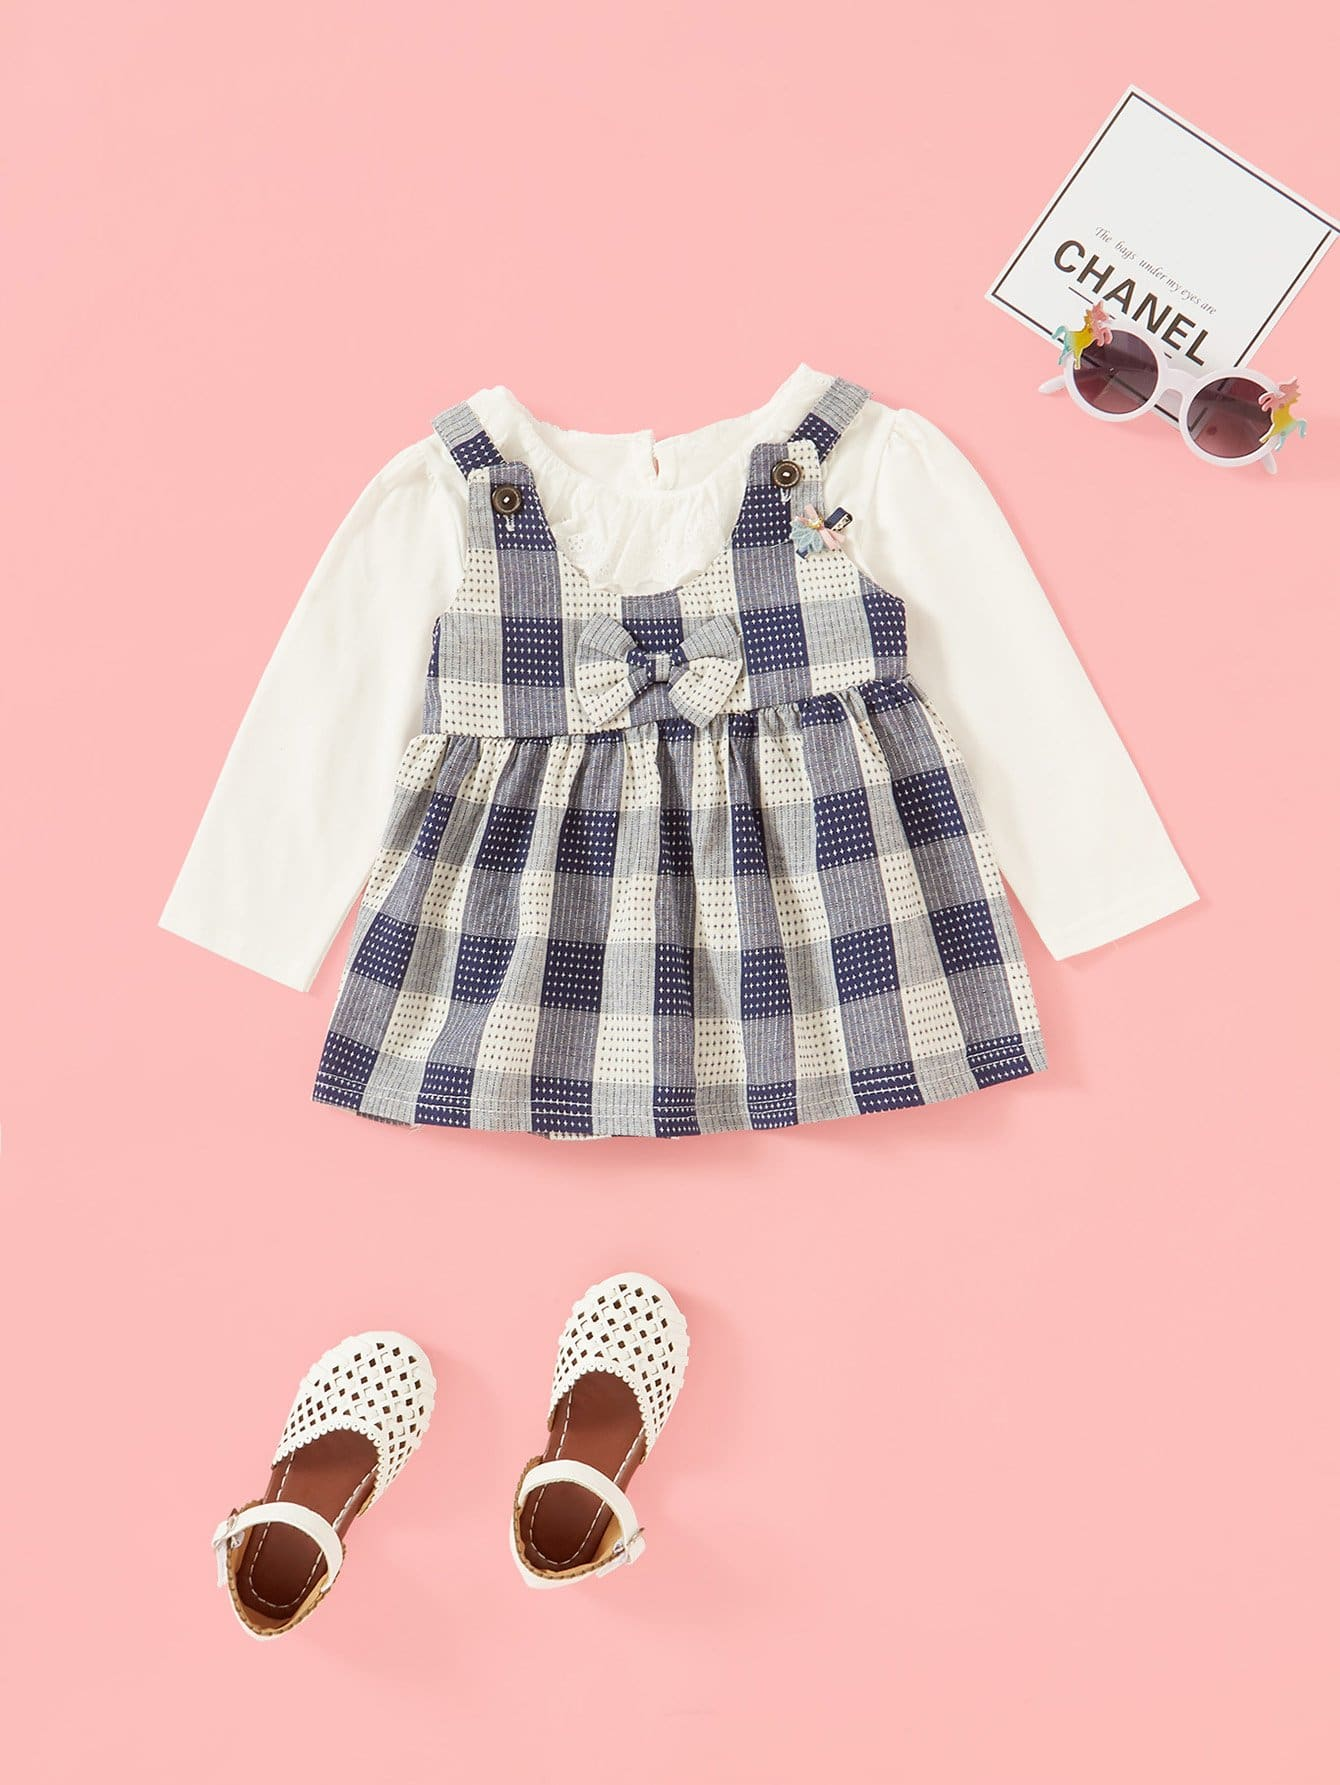 Bow Detail 2 In 1 Dress kids bow detail 2 in 1 dress